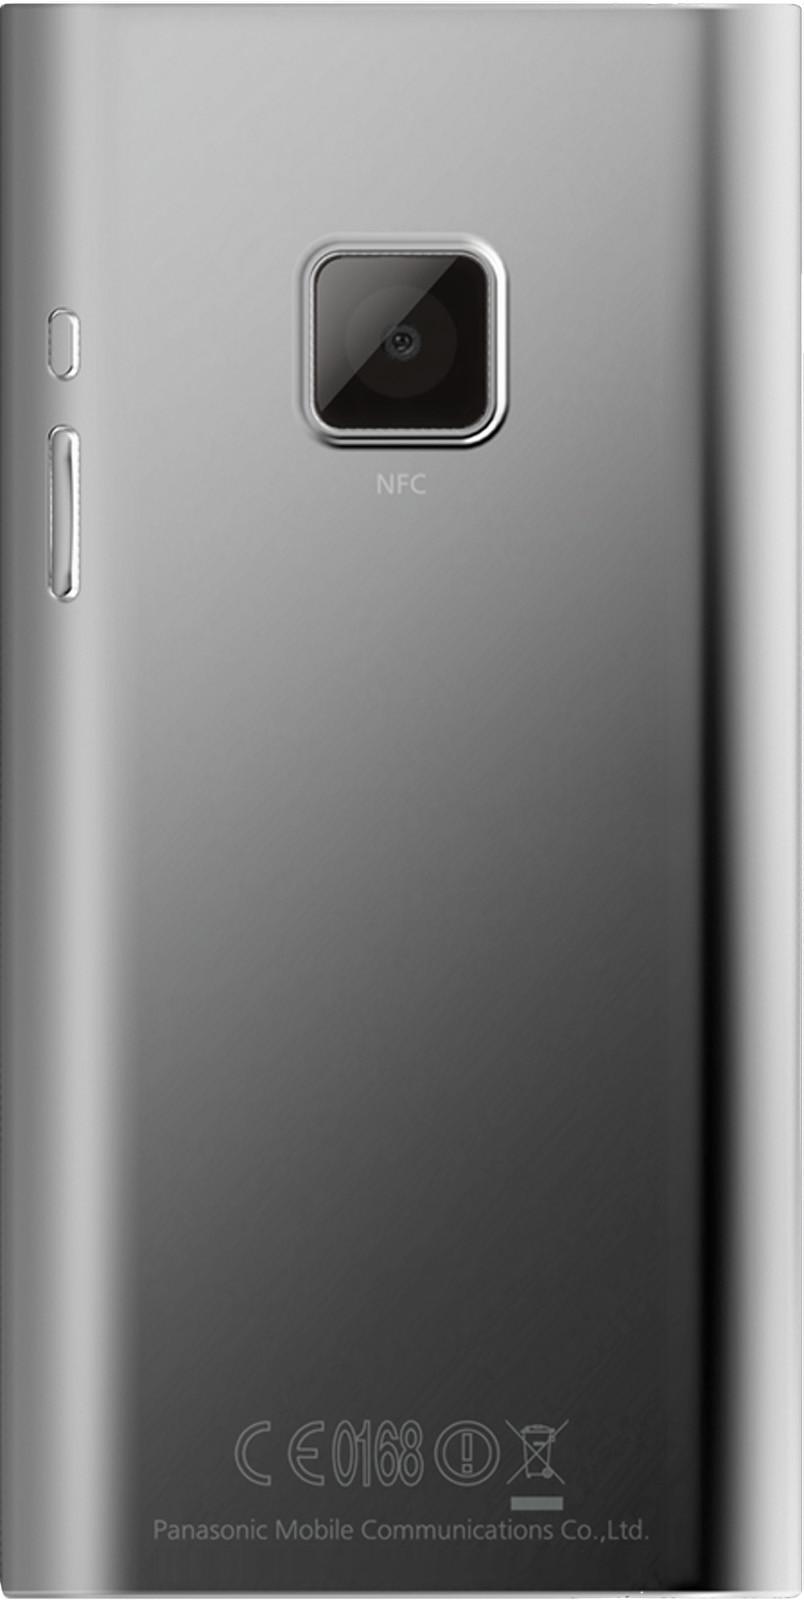 Panasonic Android phone contra agua